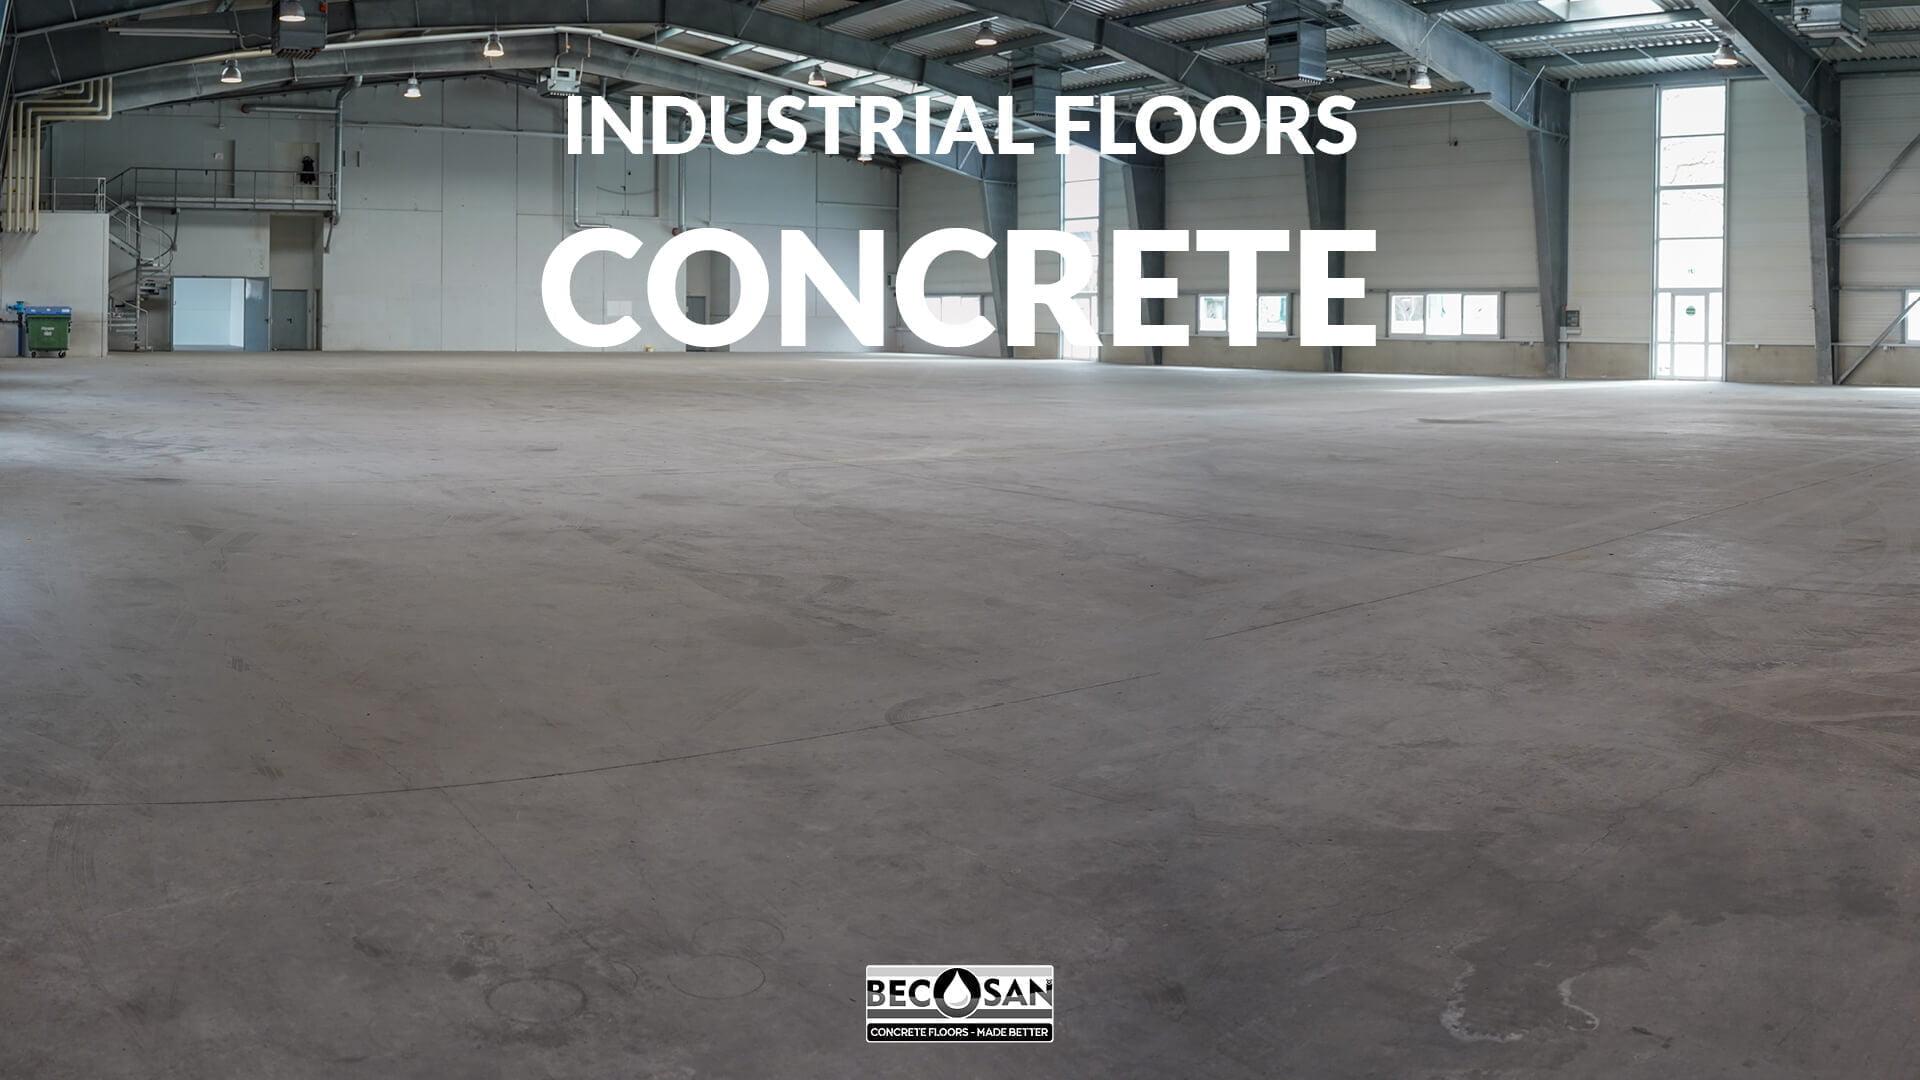 industrial floors - concrete